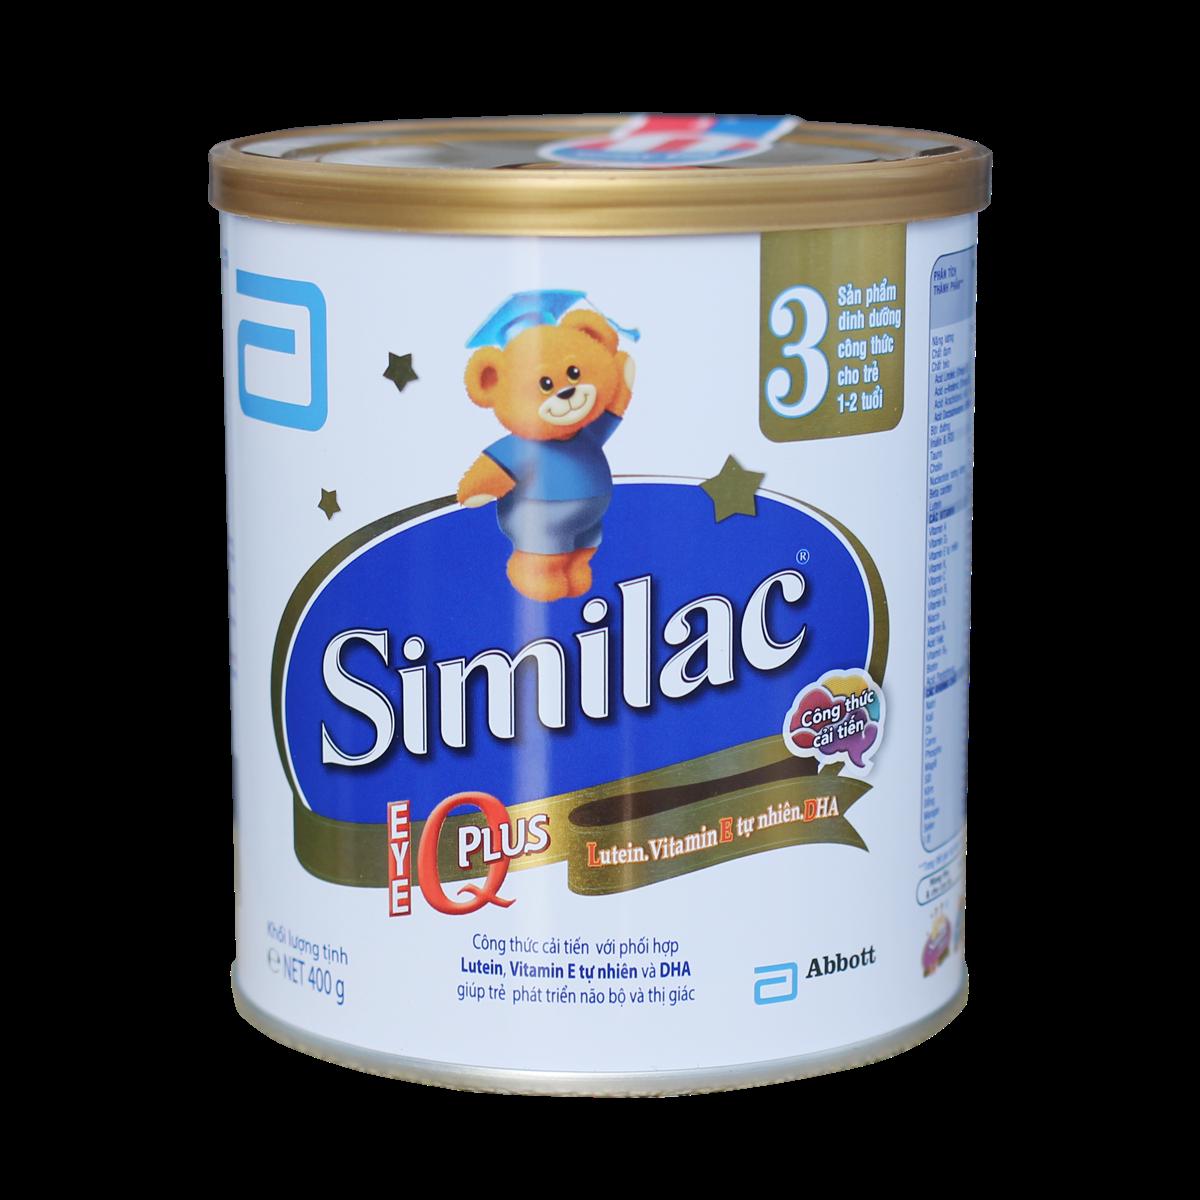 Sữa Similac IQ Plus số 3 - 400g (1-2 tuổi)